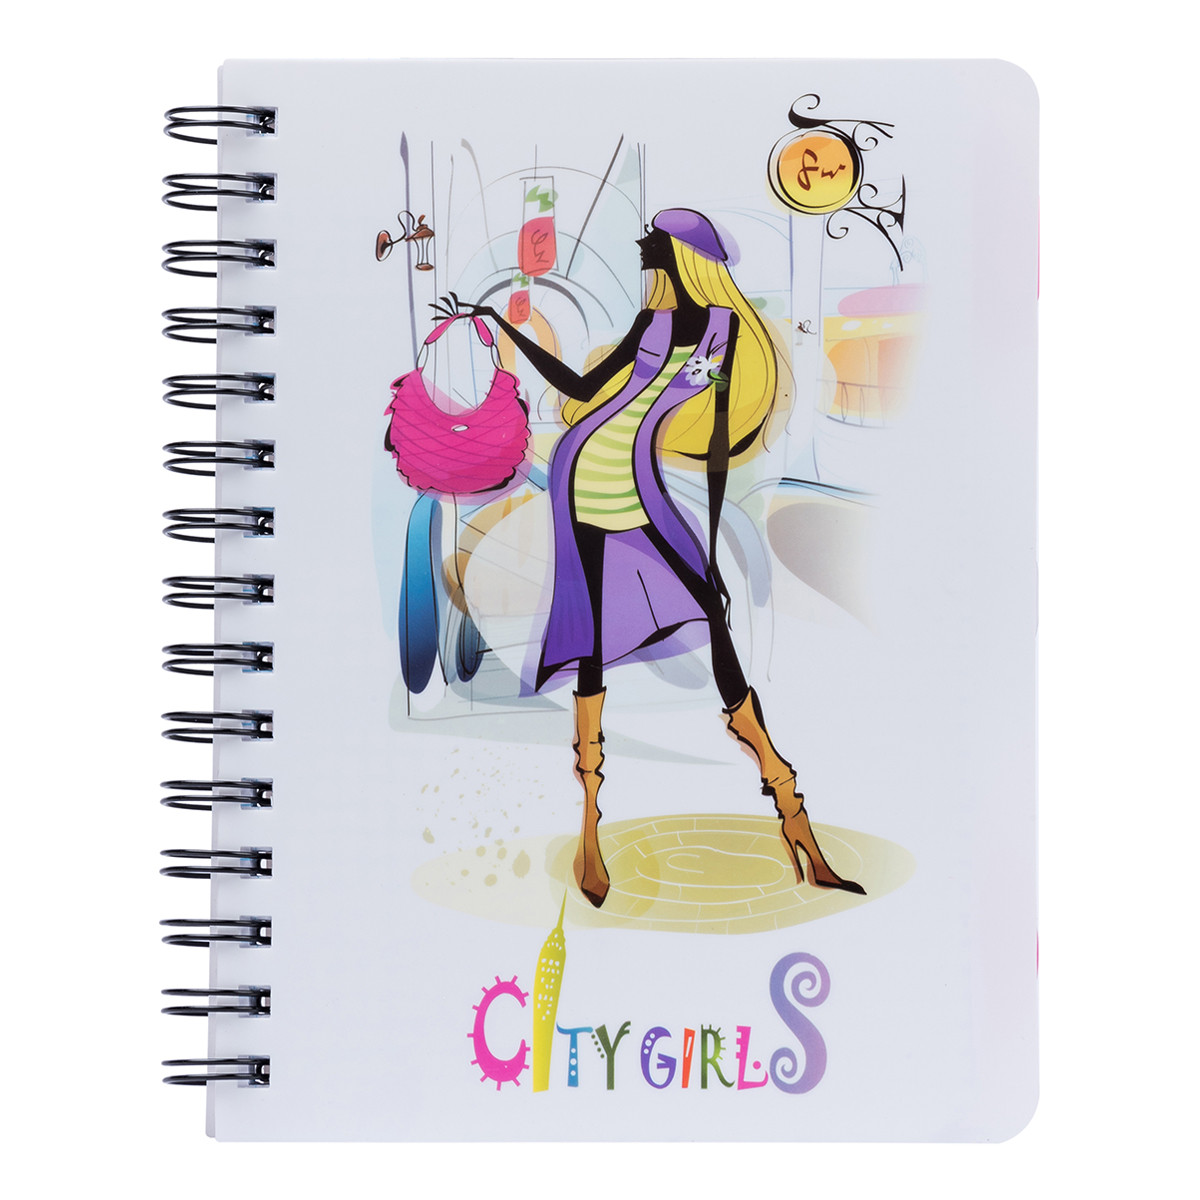 Тетрадь для записей А5/120 пл.обл. City girls YES